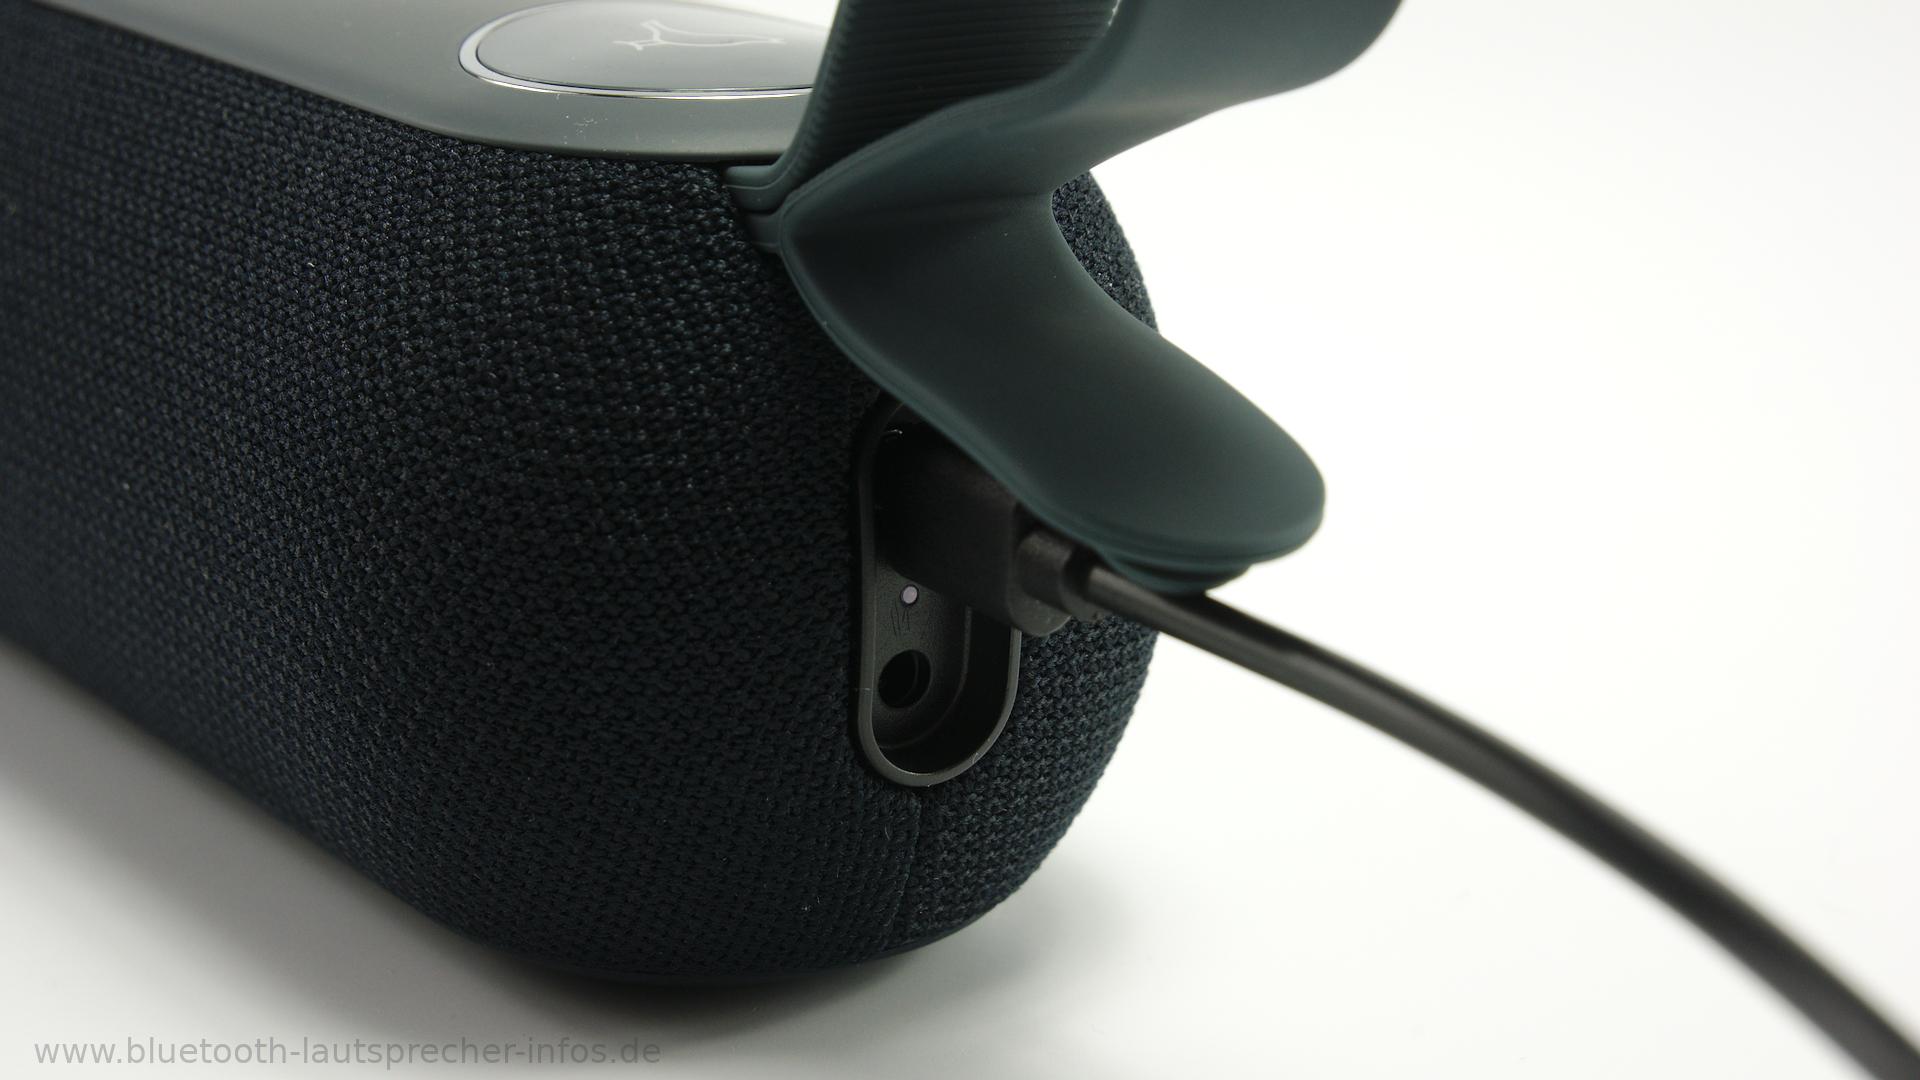 libratone too im test kleiner 360 bluetooth lautsprecher bluetooth lautsprecher. Black Bedroom Furniture Sets. Home Design Ideas